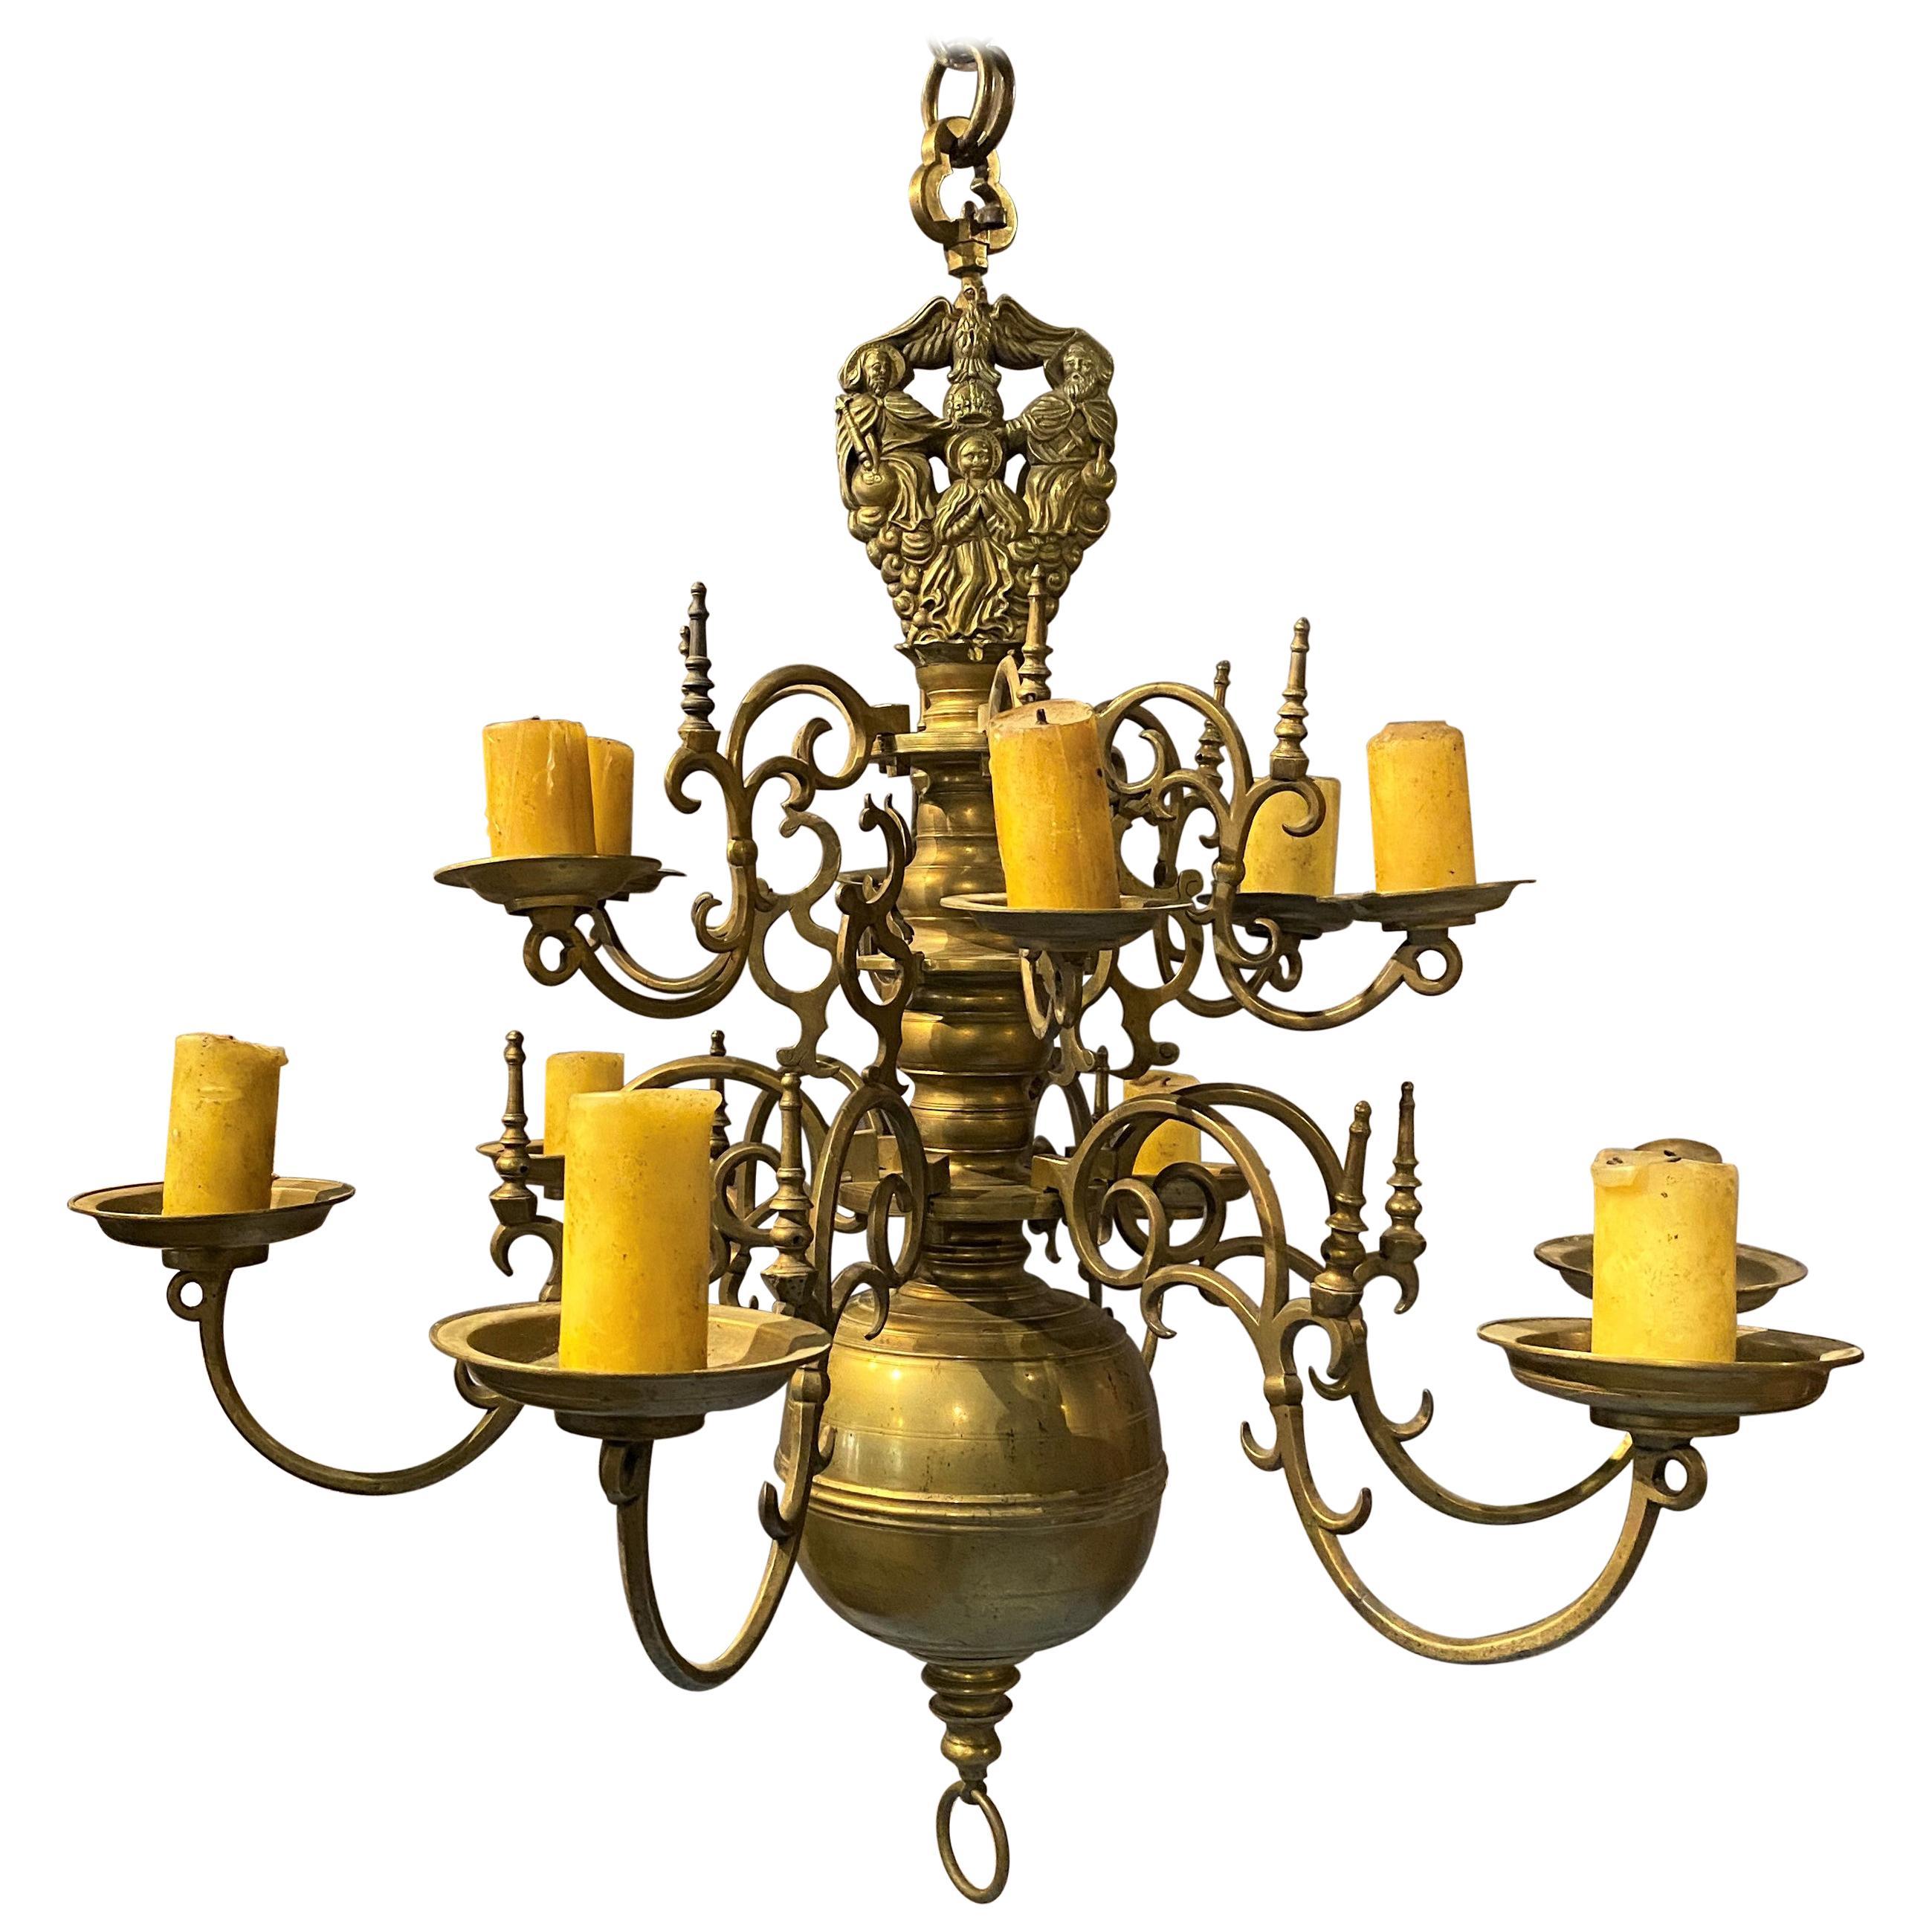 Fine 17th-18th Century Polish or Dutch Brass Two-Tier 12-Light Chandelier